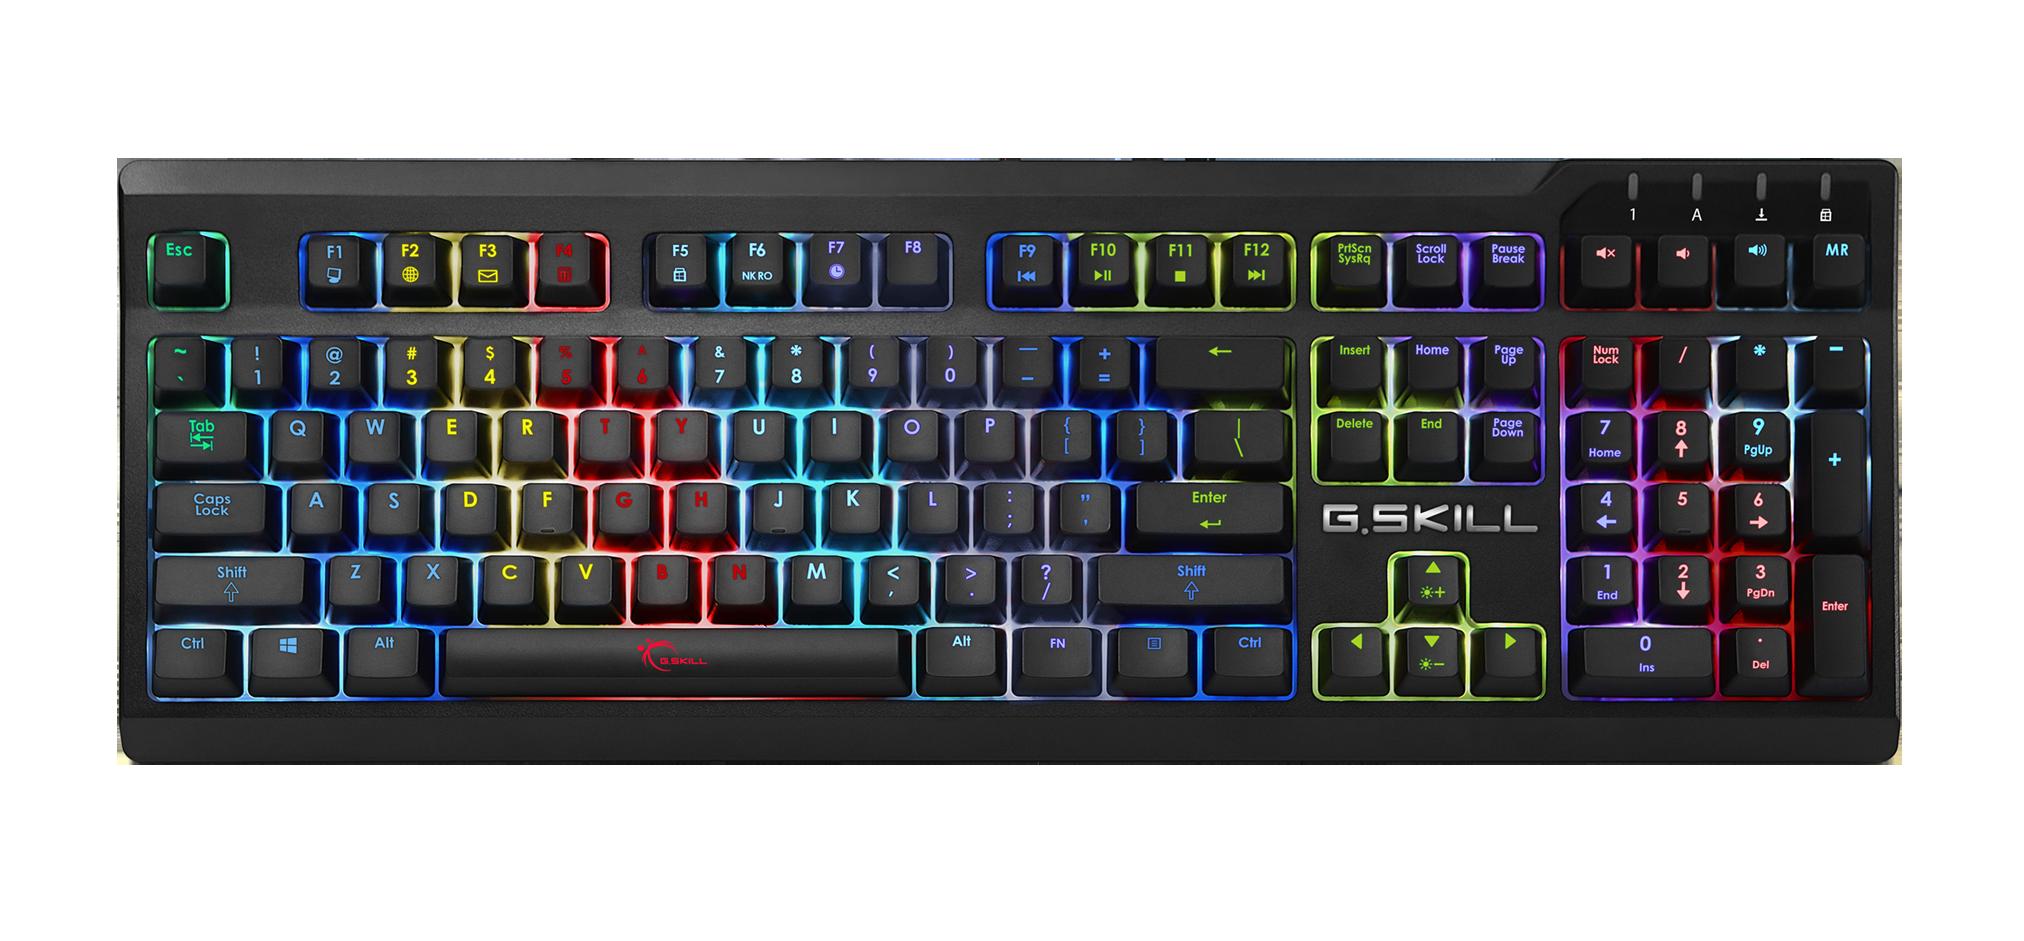 9122097f1b1 G.SKILL RIPJAWS KM570 RGB Mechanical Gaming Keyboard - Cherry MX RGB ...